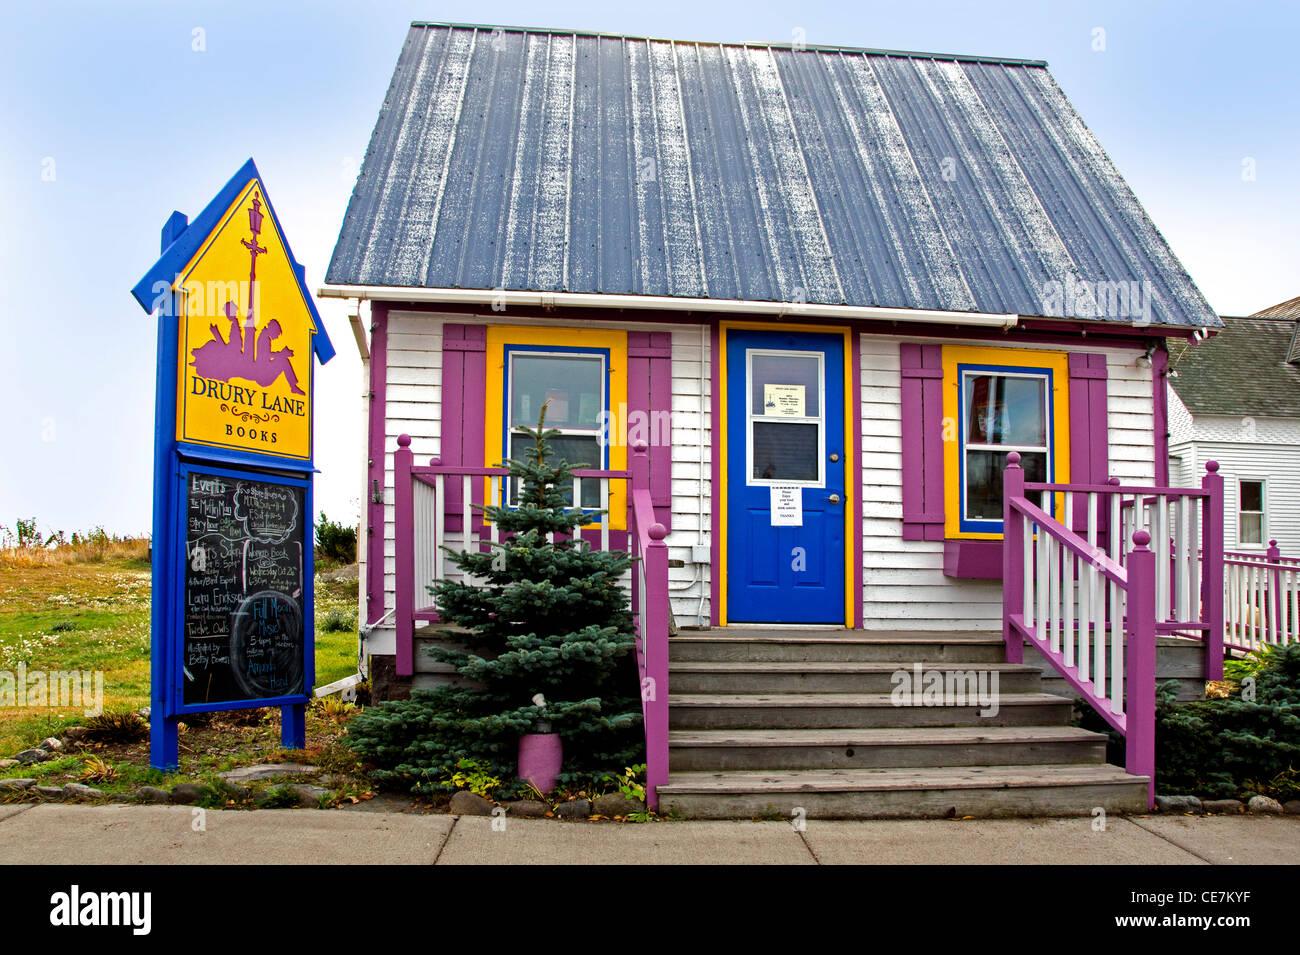 Drury Lane Books is a bookstore in Grand Marais, Minnesota in the North Shore area along Lake Superior. - Stock Image